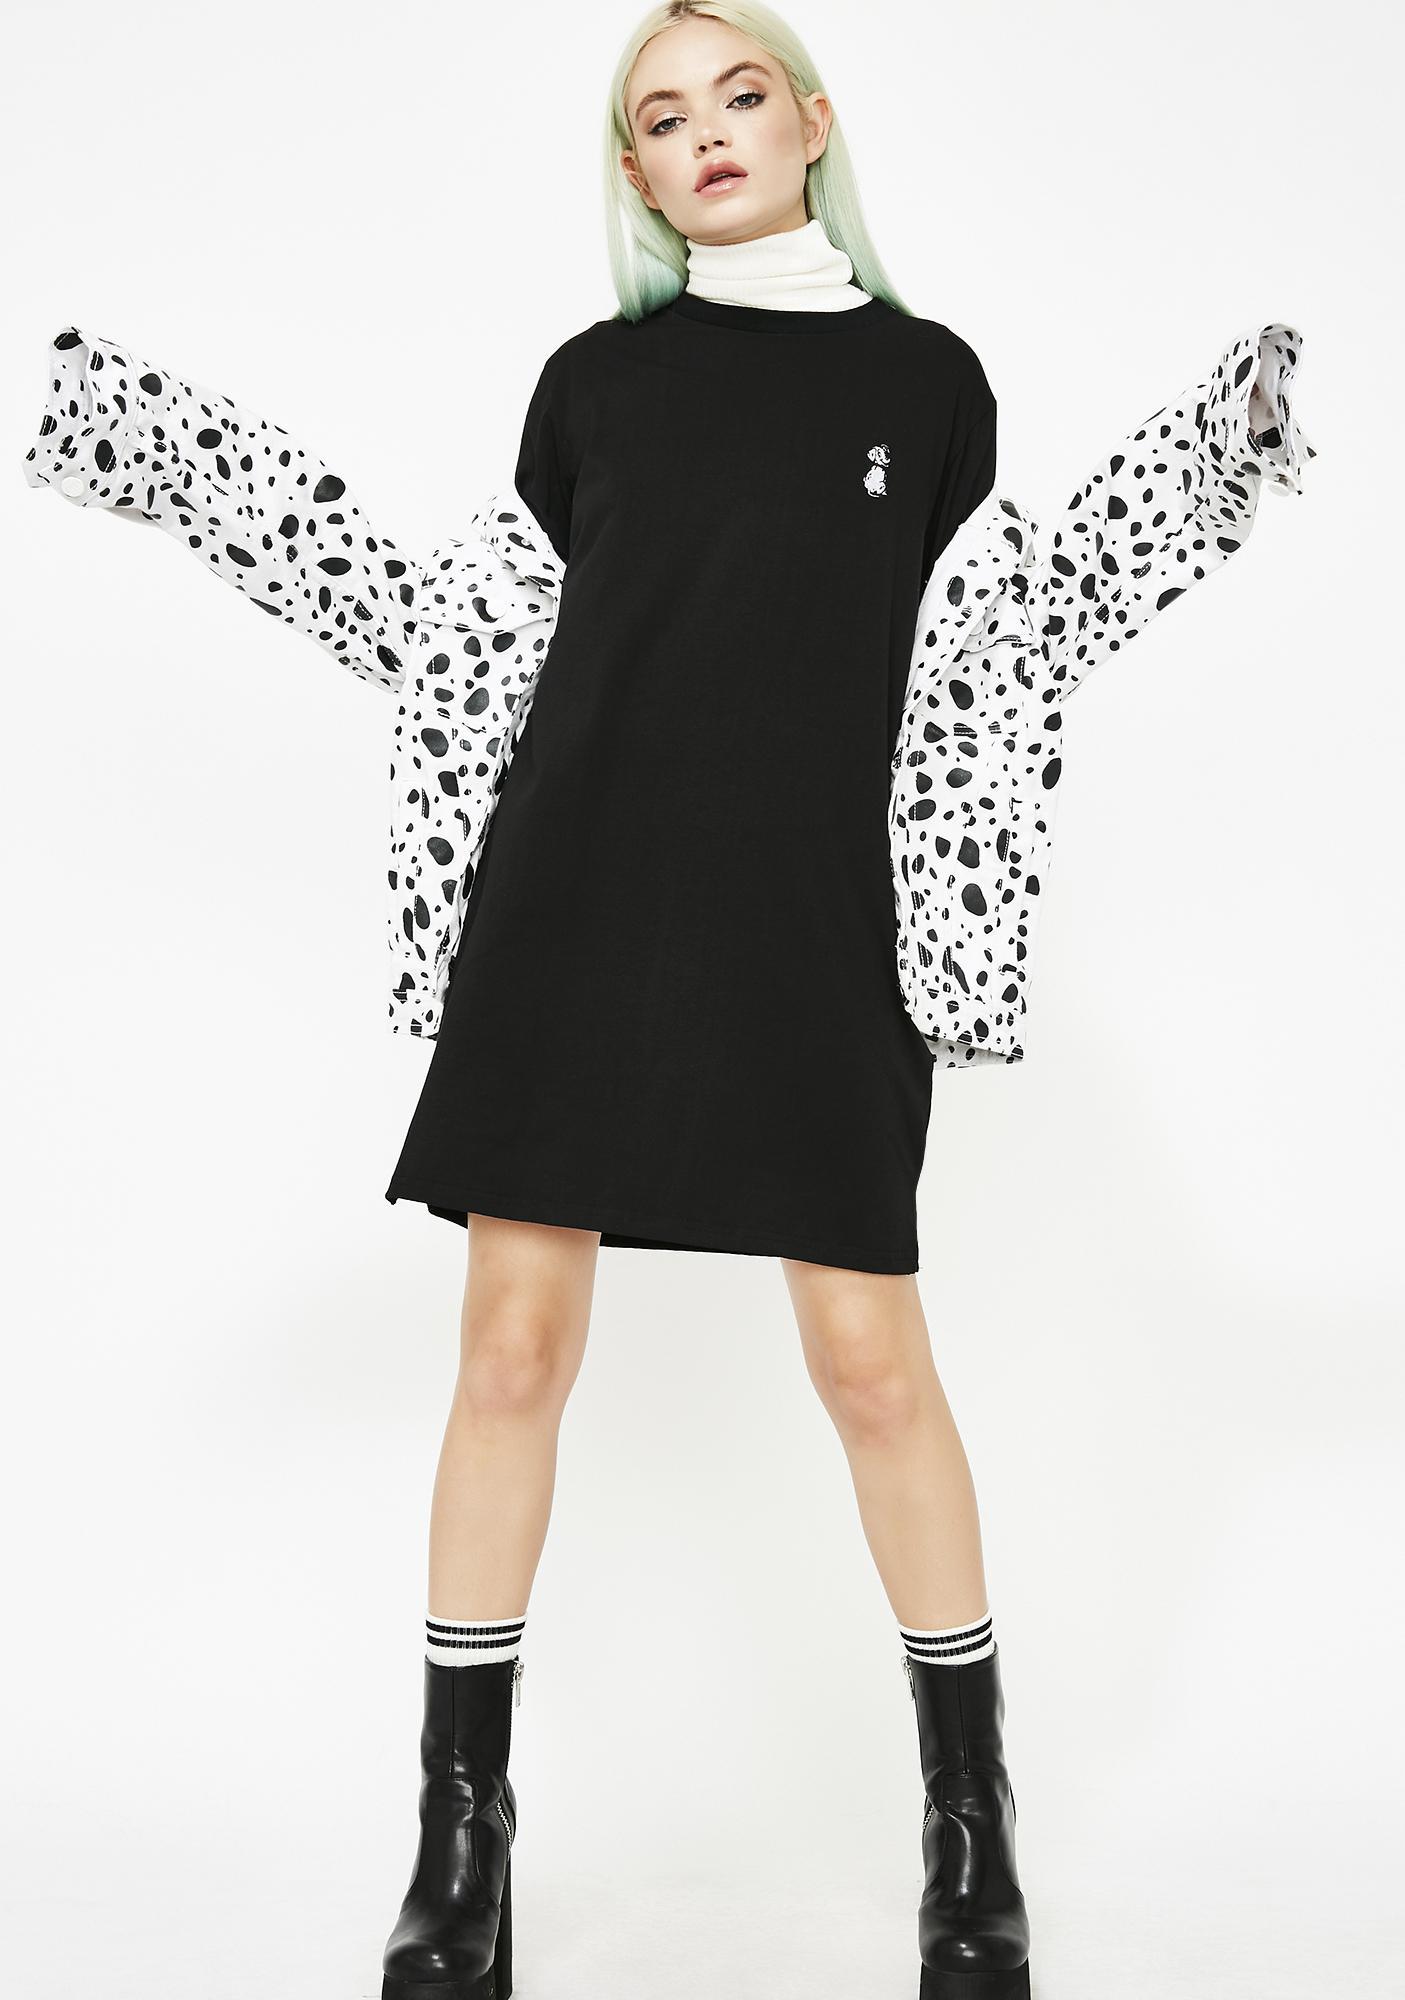 Nana Judy x Disney Together Dress